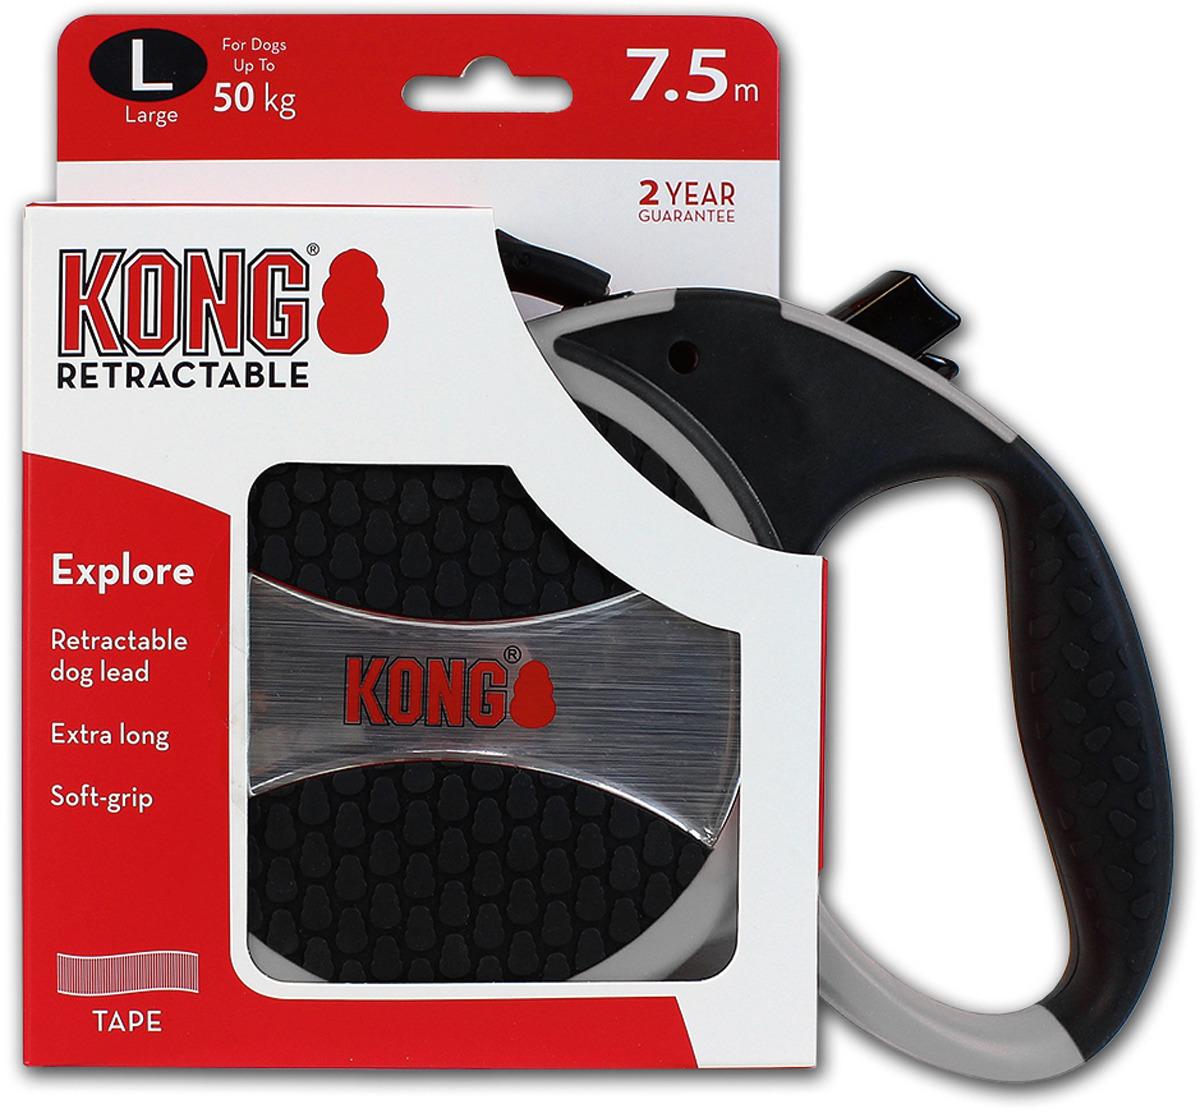 Поводок-рулетка для собак Kong Explore L, цвет: серый, до 50 кг, 7,5 м